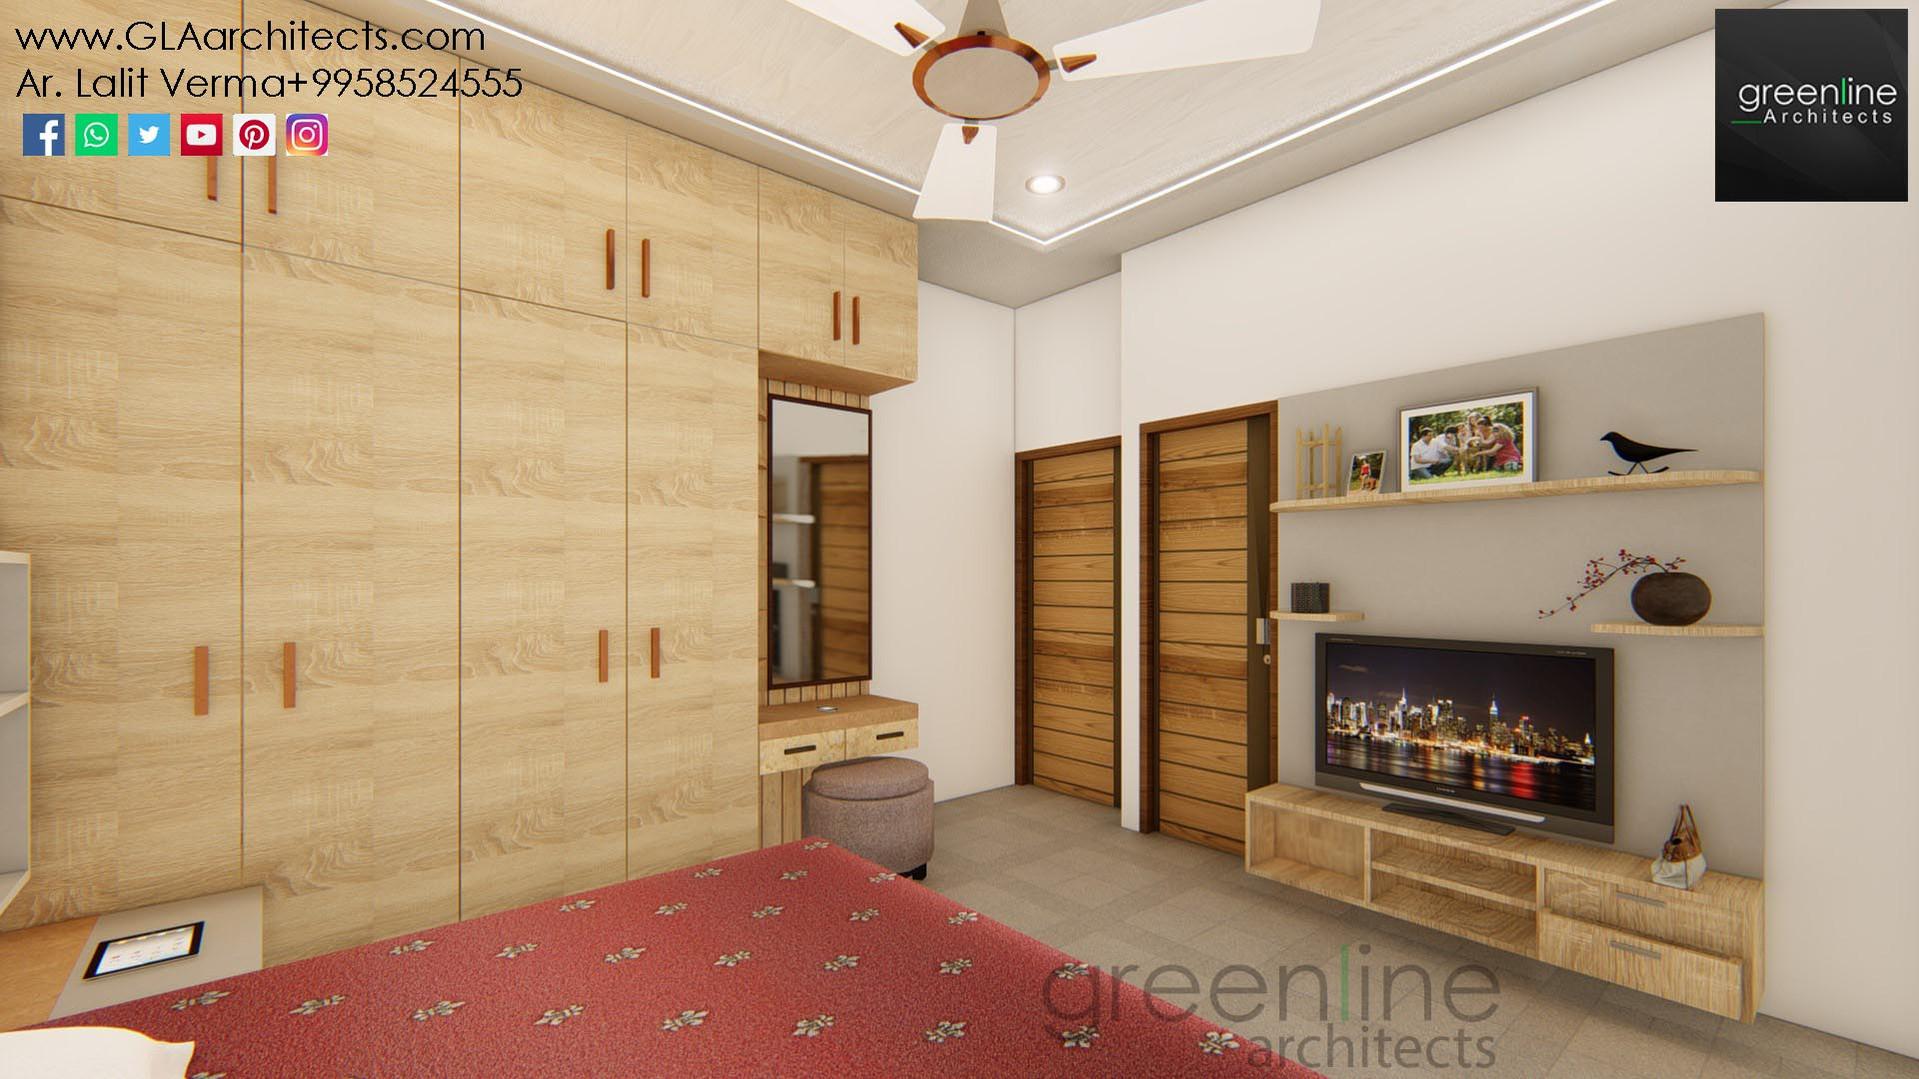 3 BHK-Apartment_Home Interior (9).jpg